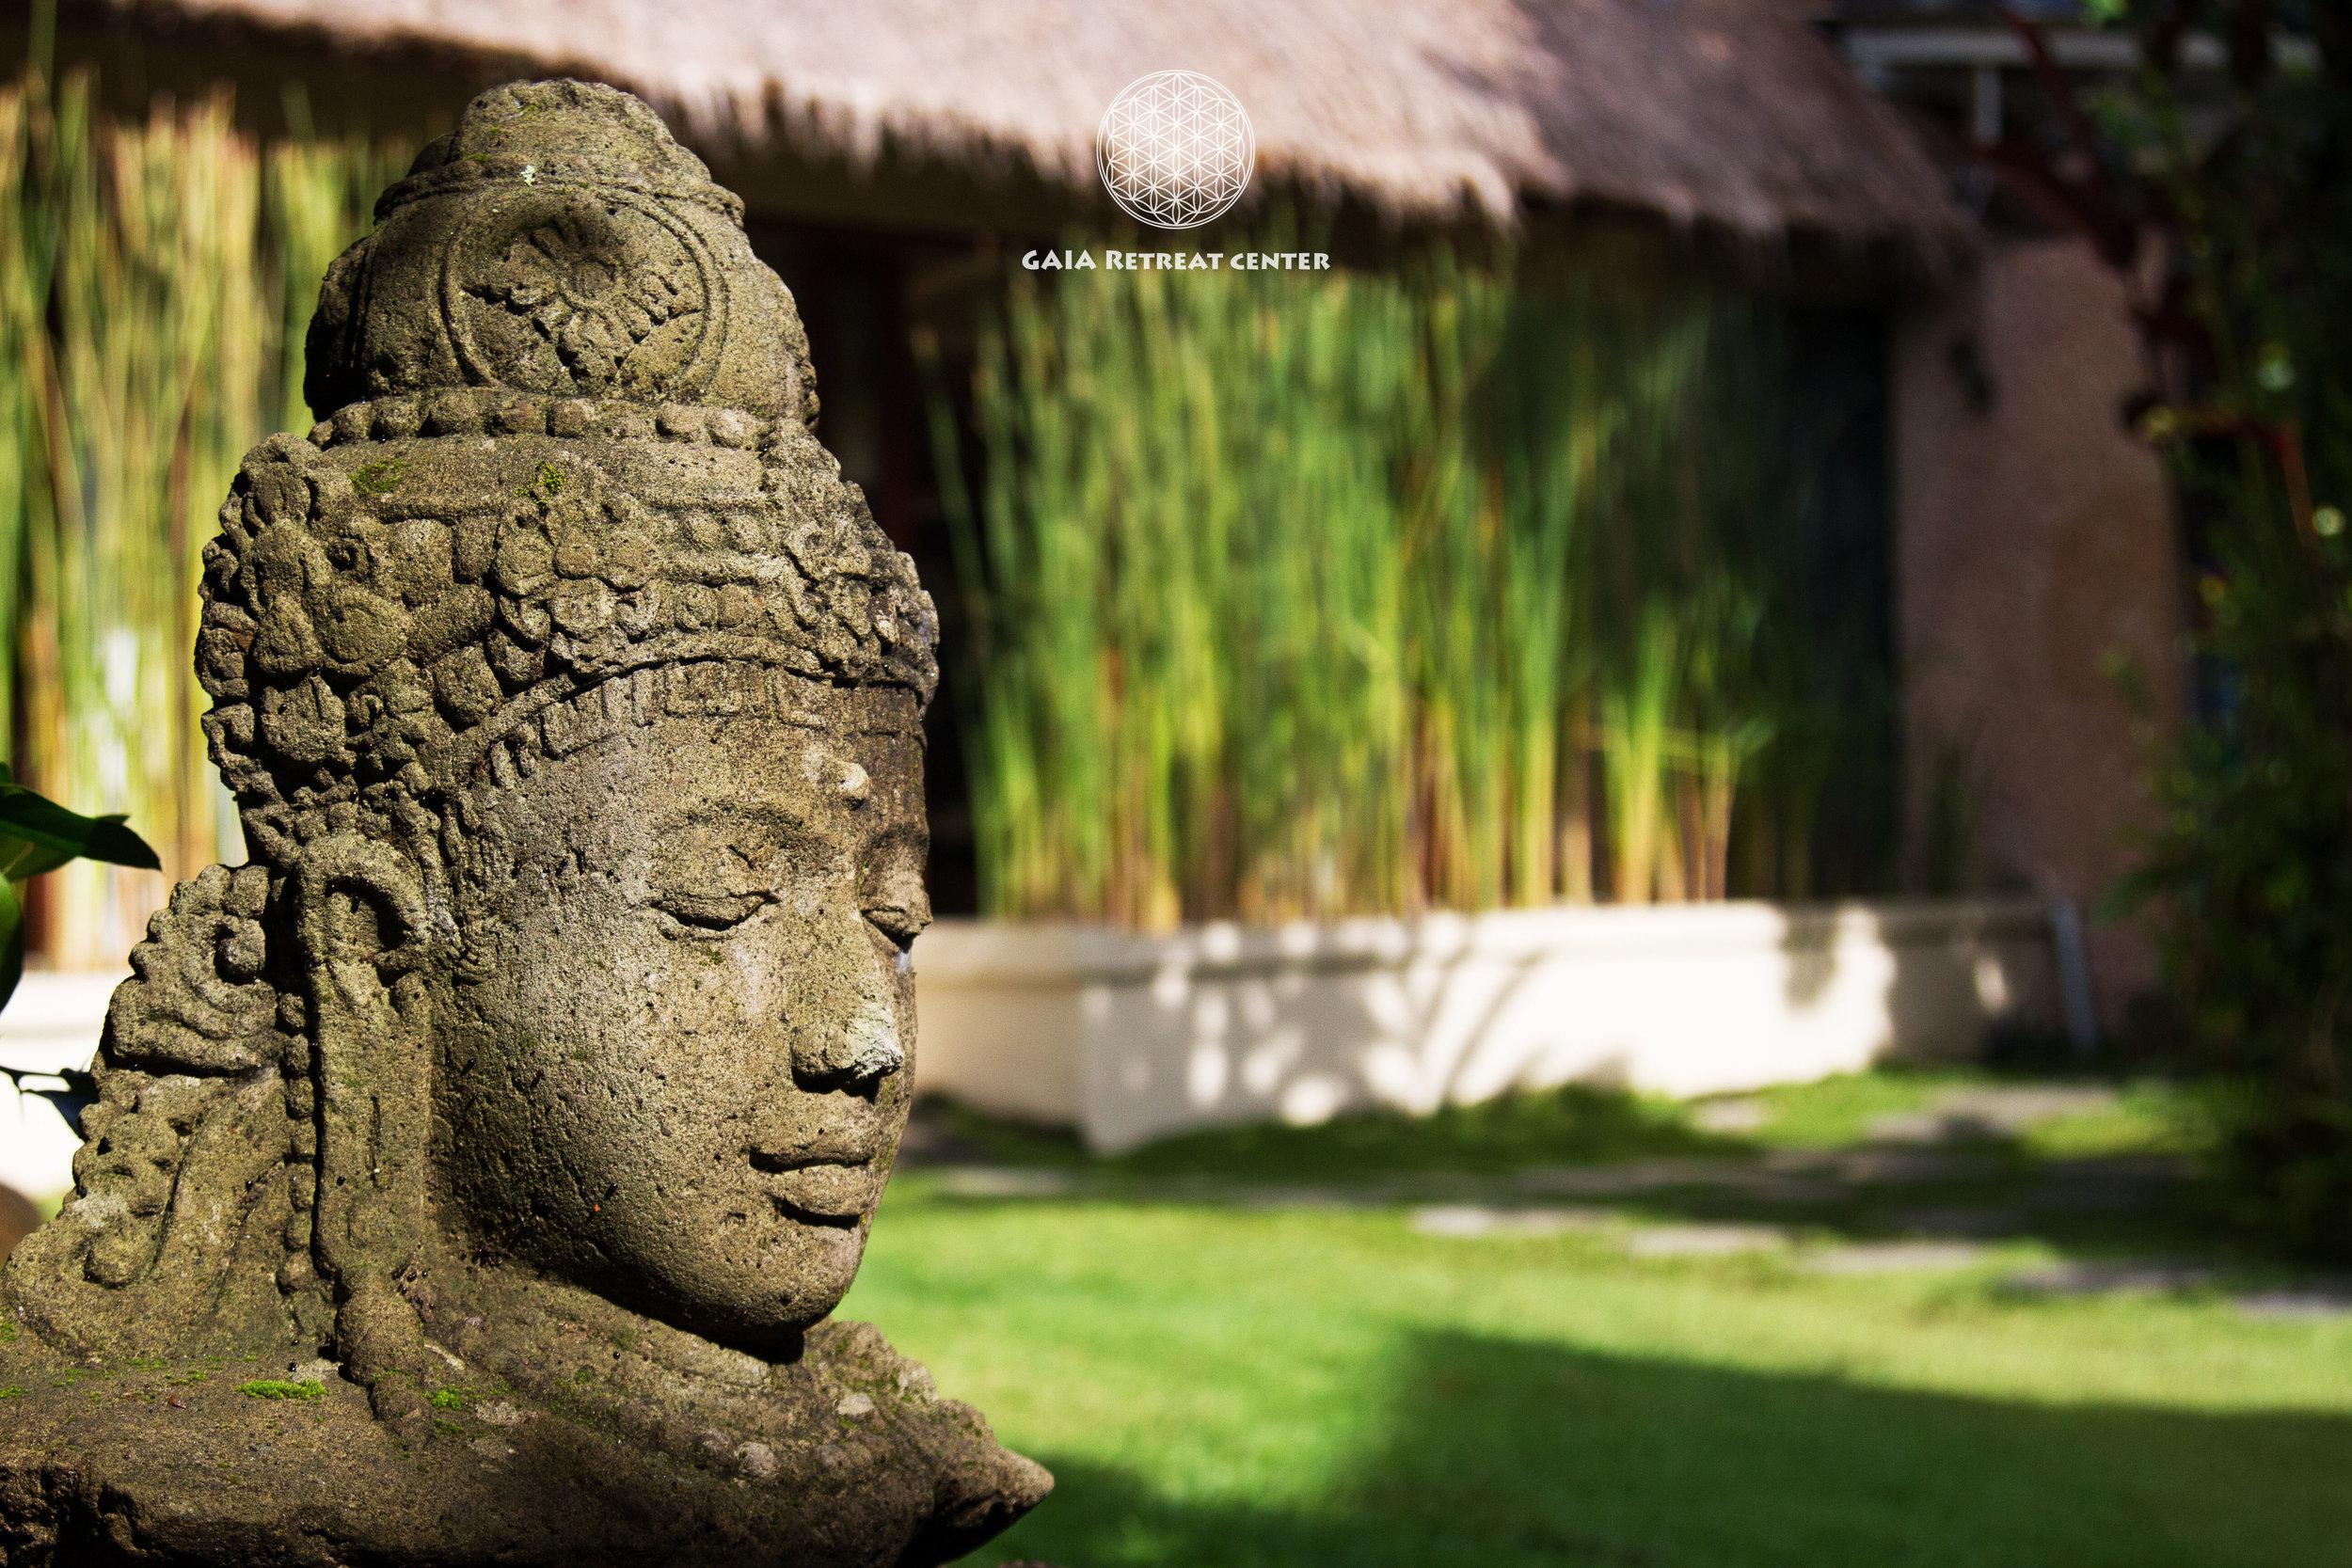 Gaia Retreat Center Bali Statue.jpg